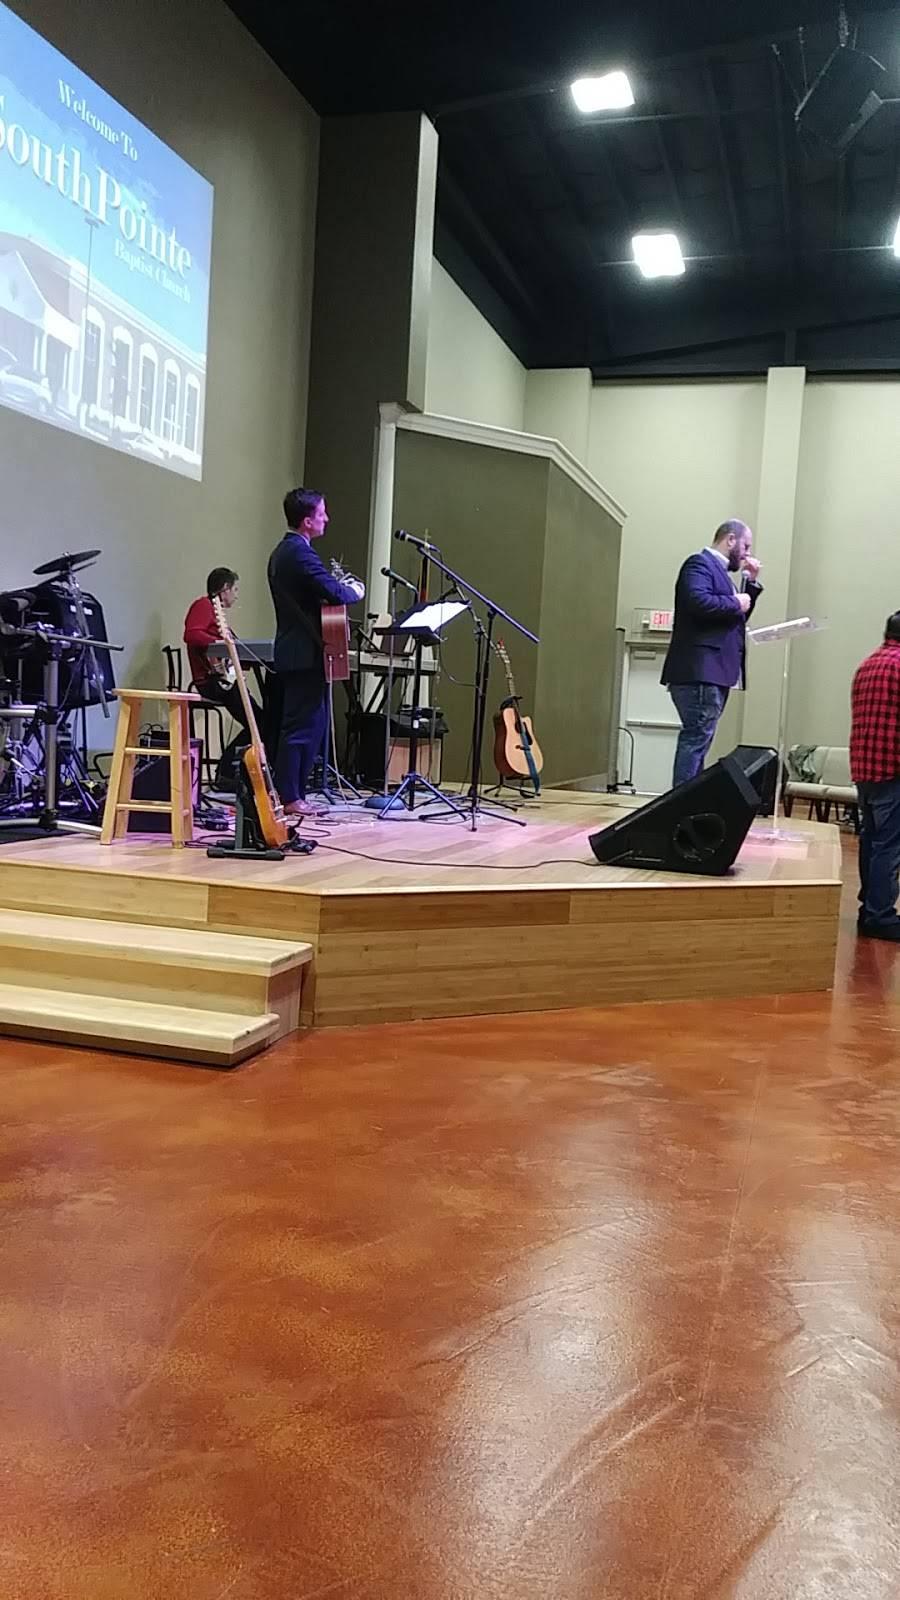 Southpointe Baptist Church - church  | Photo 6 of 7 | Address: 901 Debbie Ln, Arlington, TX 76002, USA | Phone: (817) 453-5550